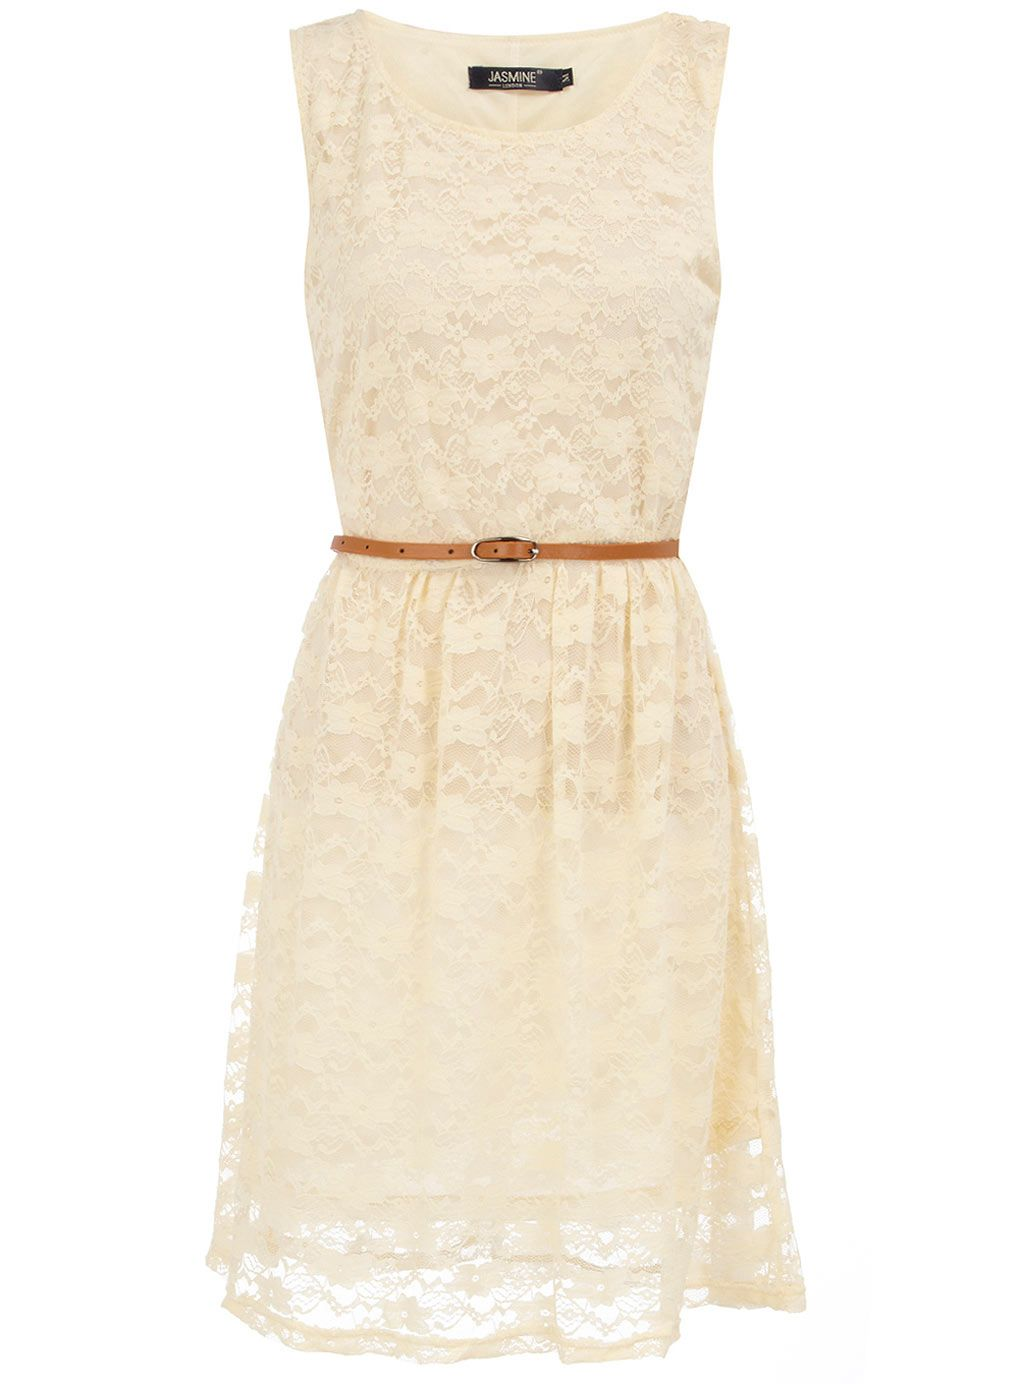 a6eeb1b1e317 Navy Blau · Beauty · Cream sleeveless lace dress. Rehearsal dinner dress   Probeessen Kleider, Hübsche Kleider, Formelle